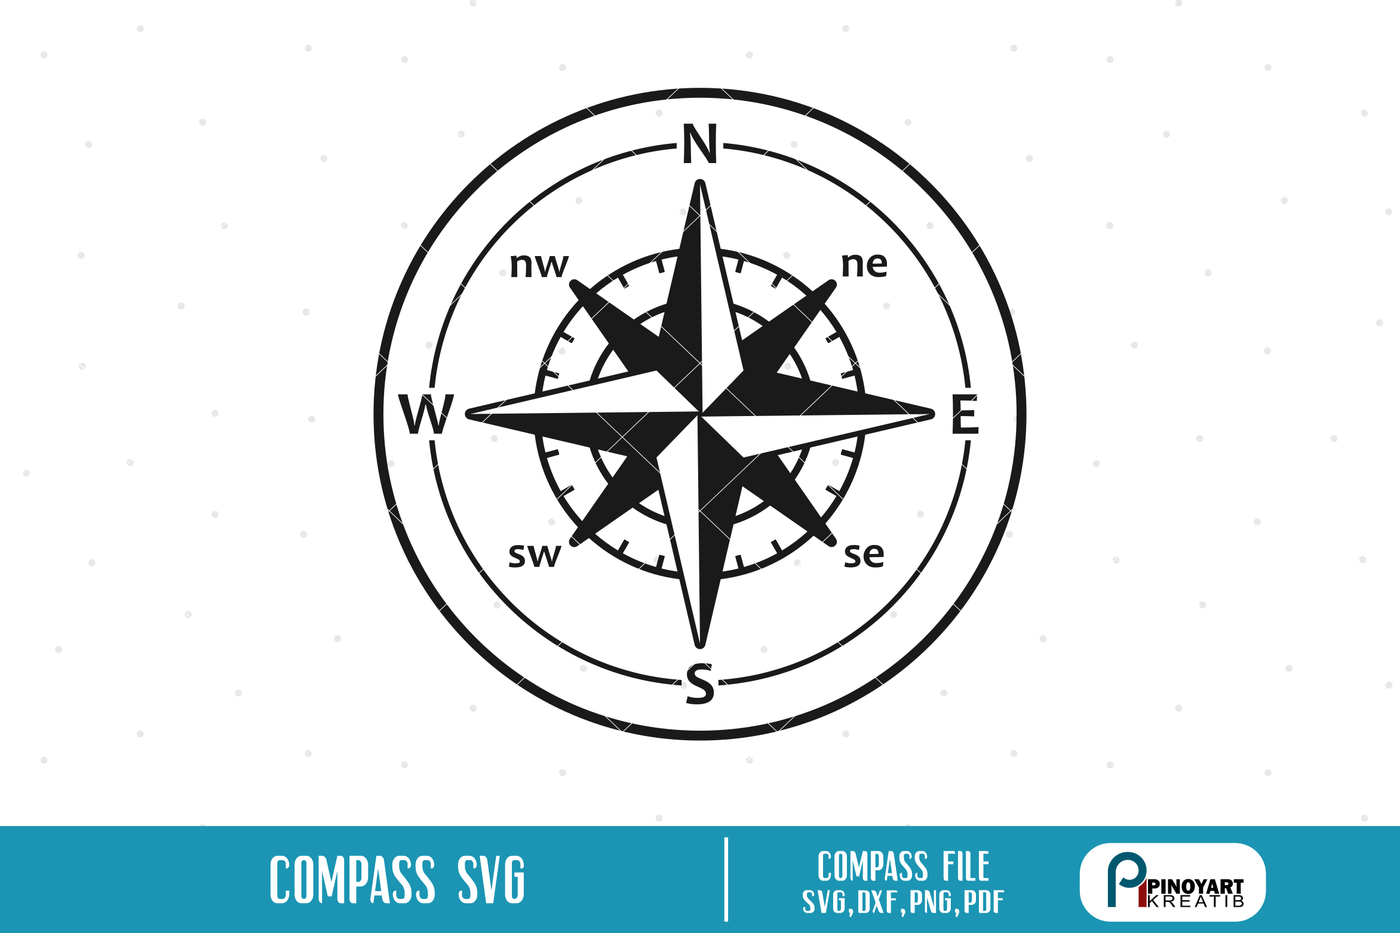 Compass Svg Compass Dial Svg Travel Svg Adventure Svg Svg